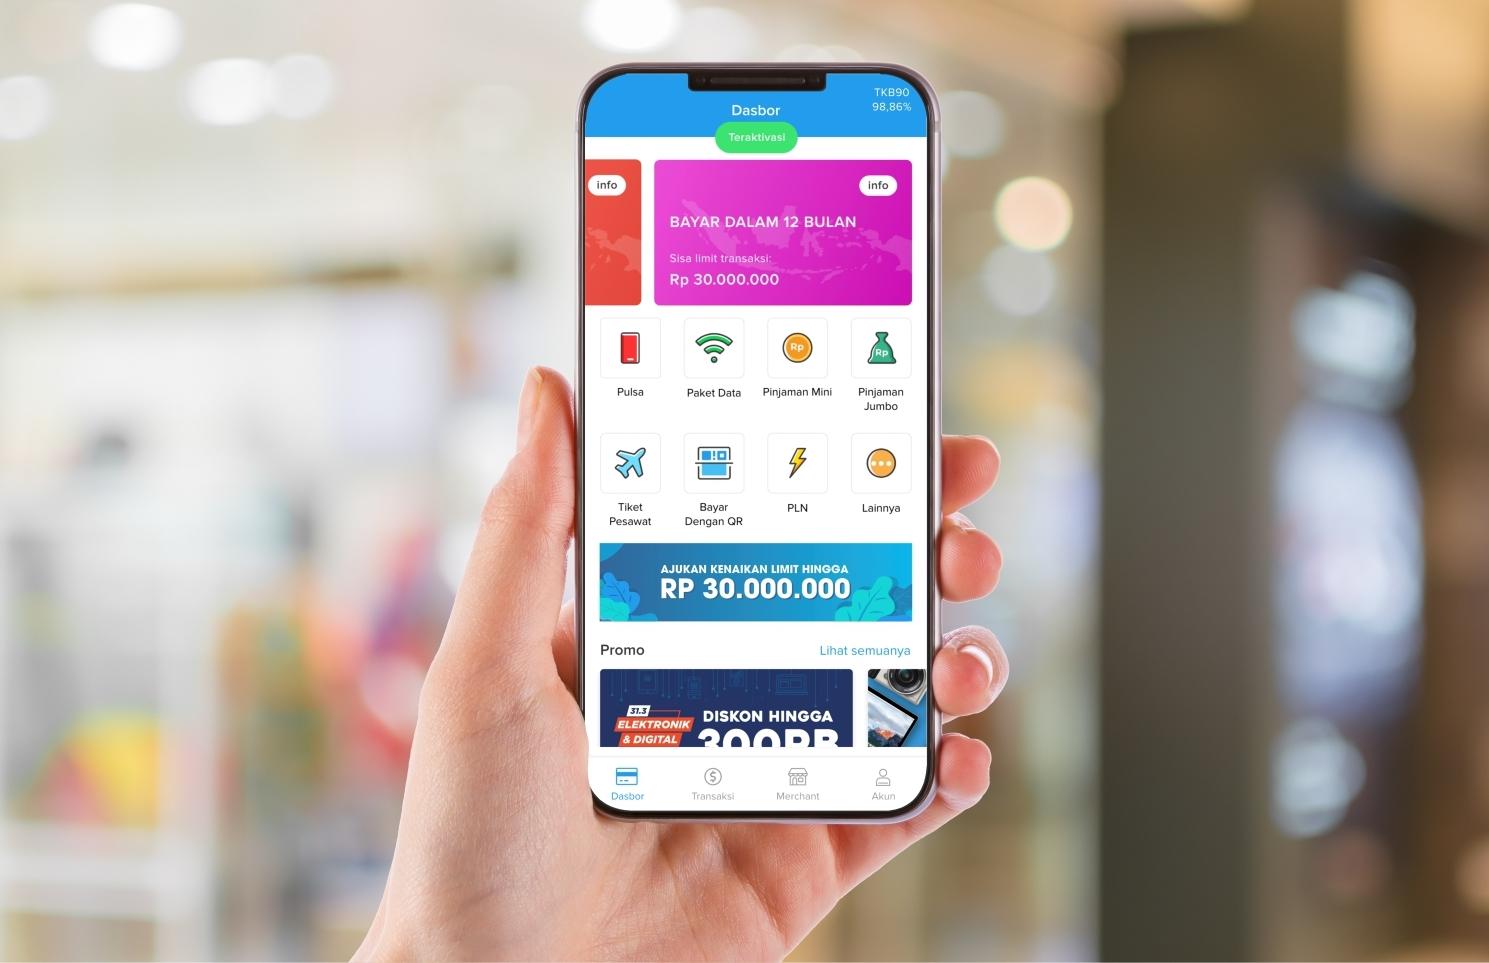 Kredivo application display on Android